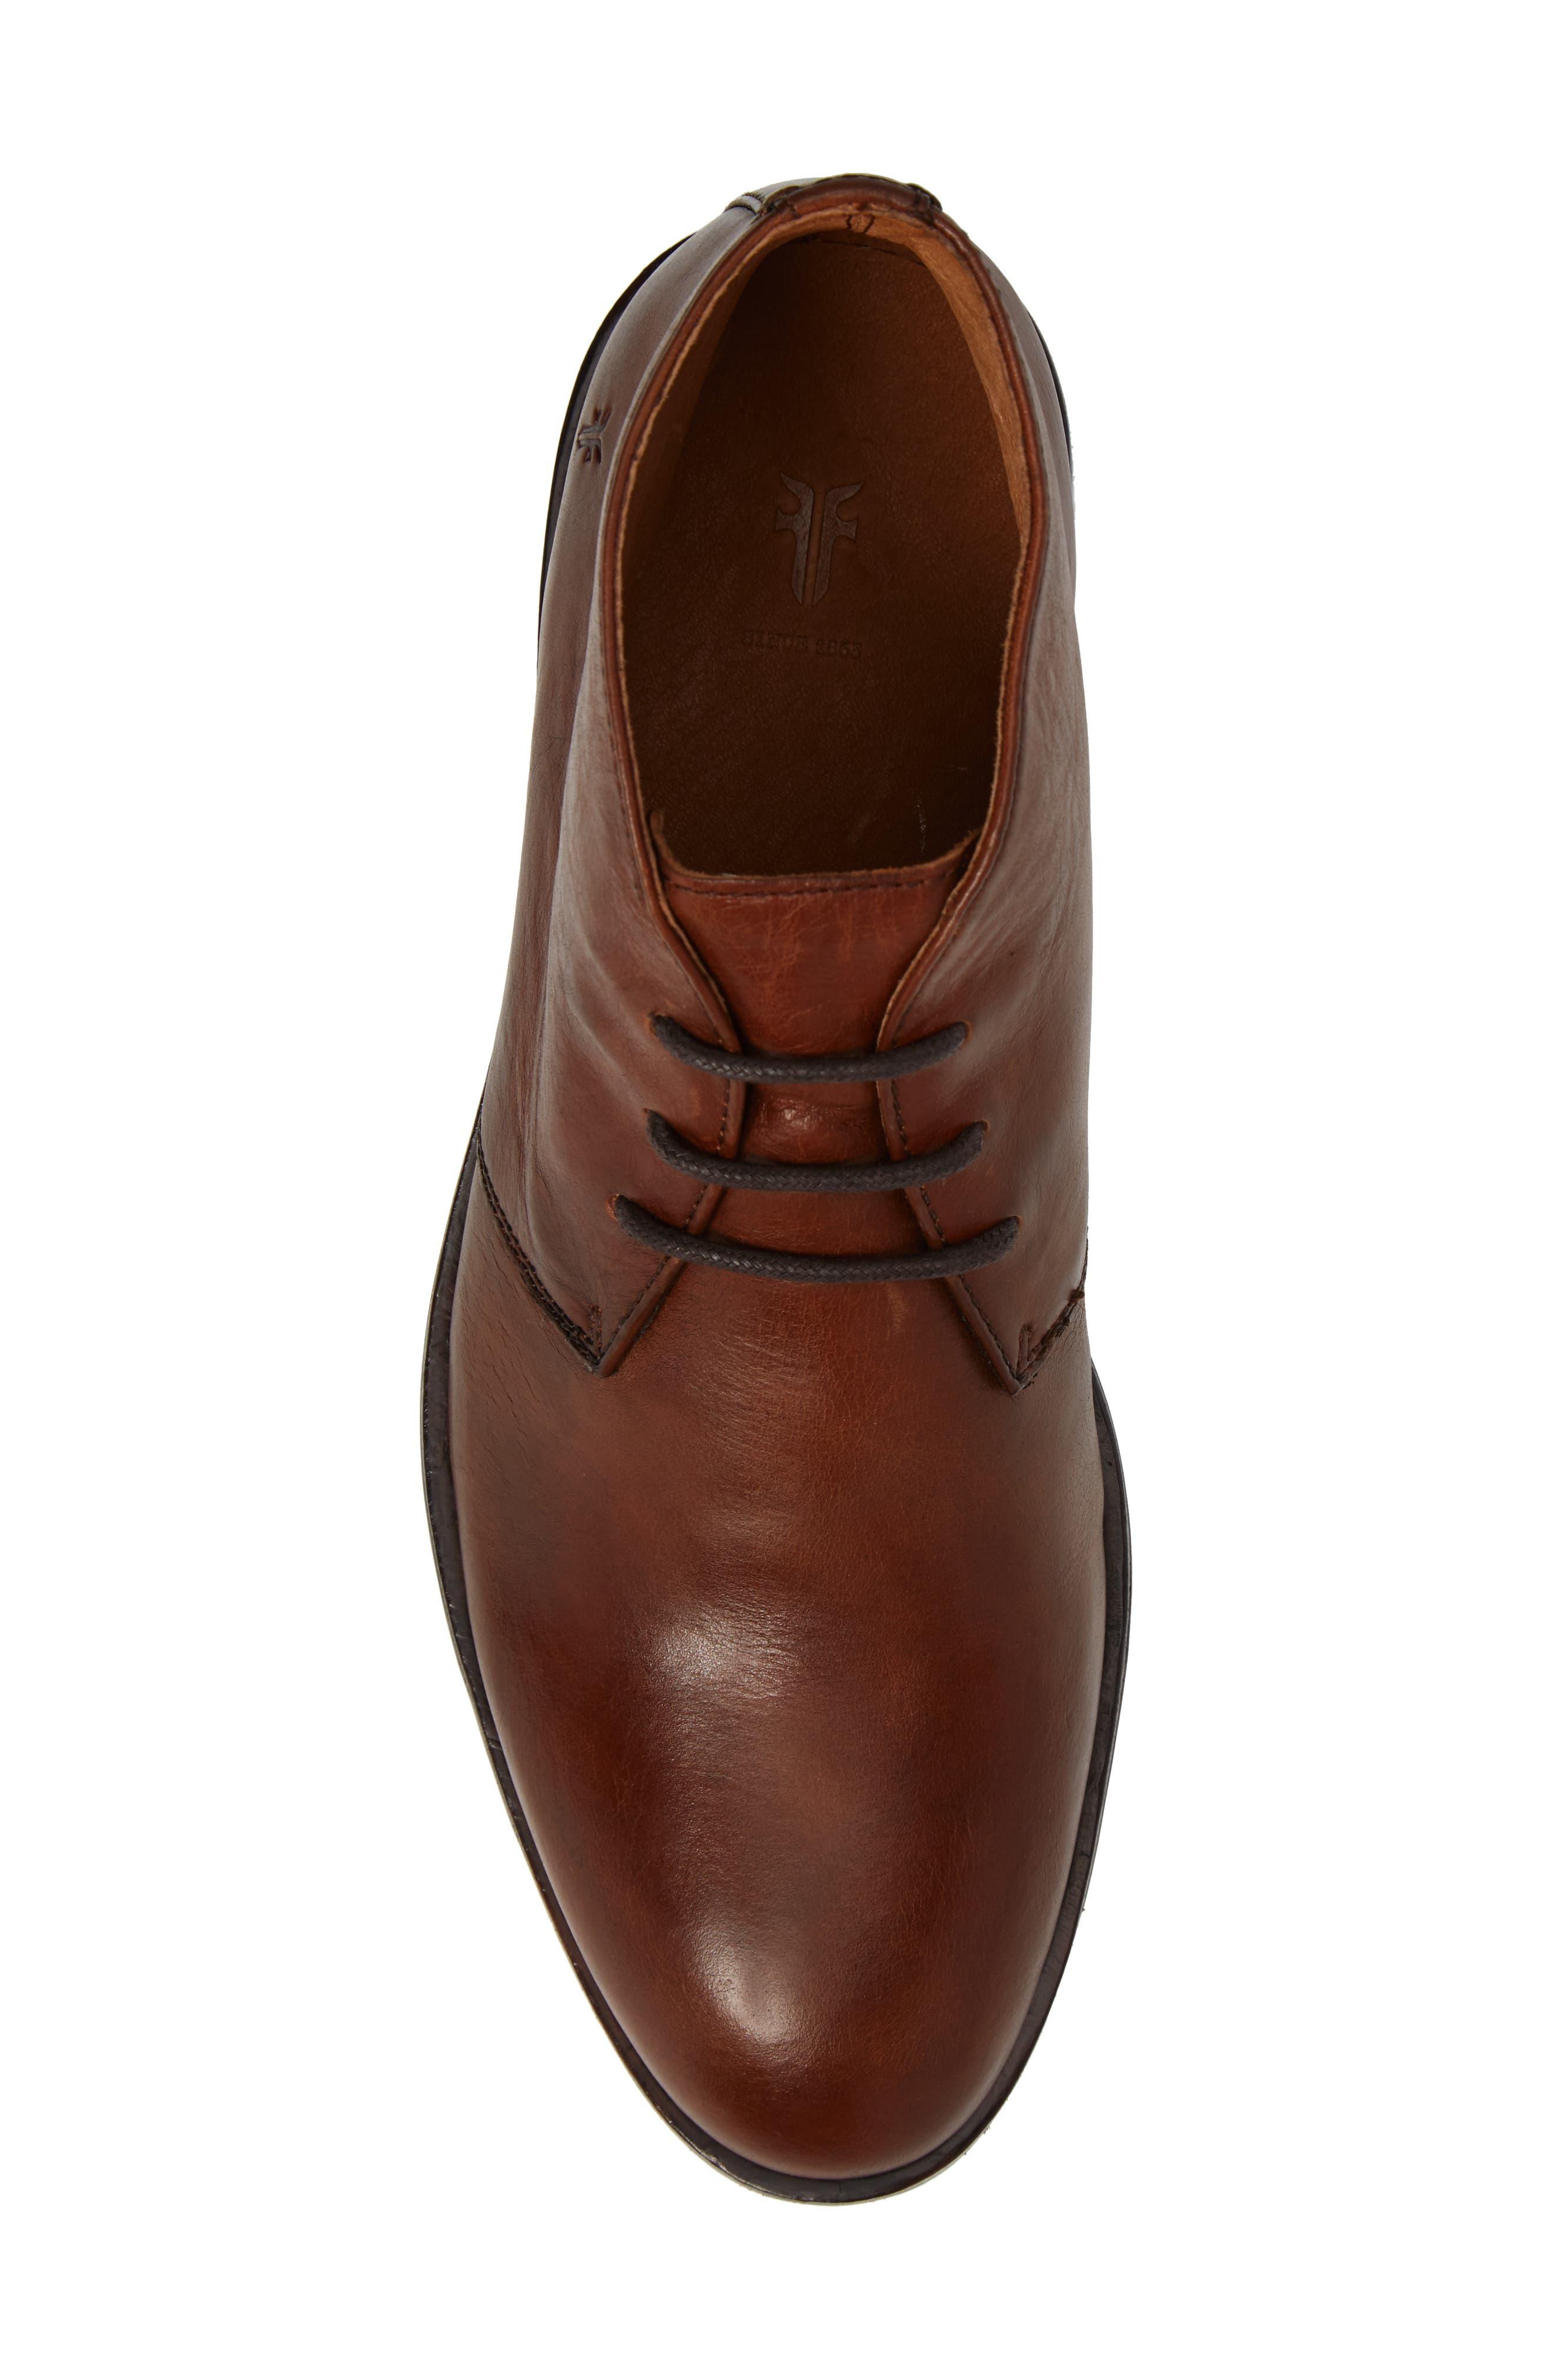 Sam Chukka Boot,                             Alternate thumbnail 5, color,                             Cognac Leather